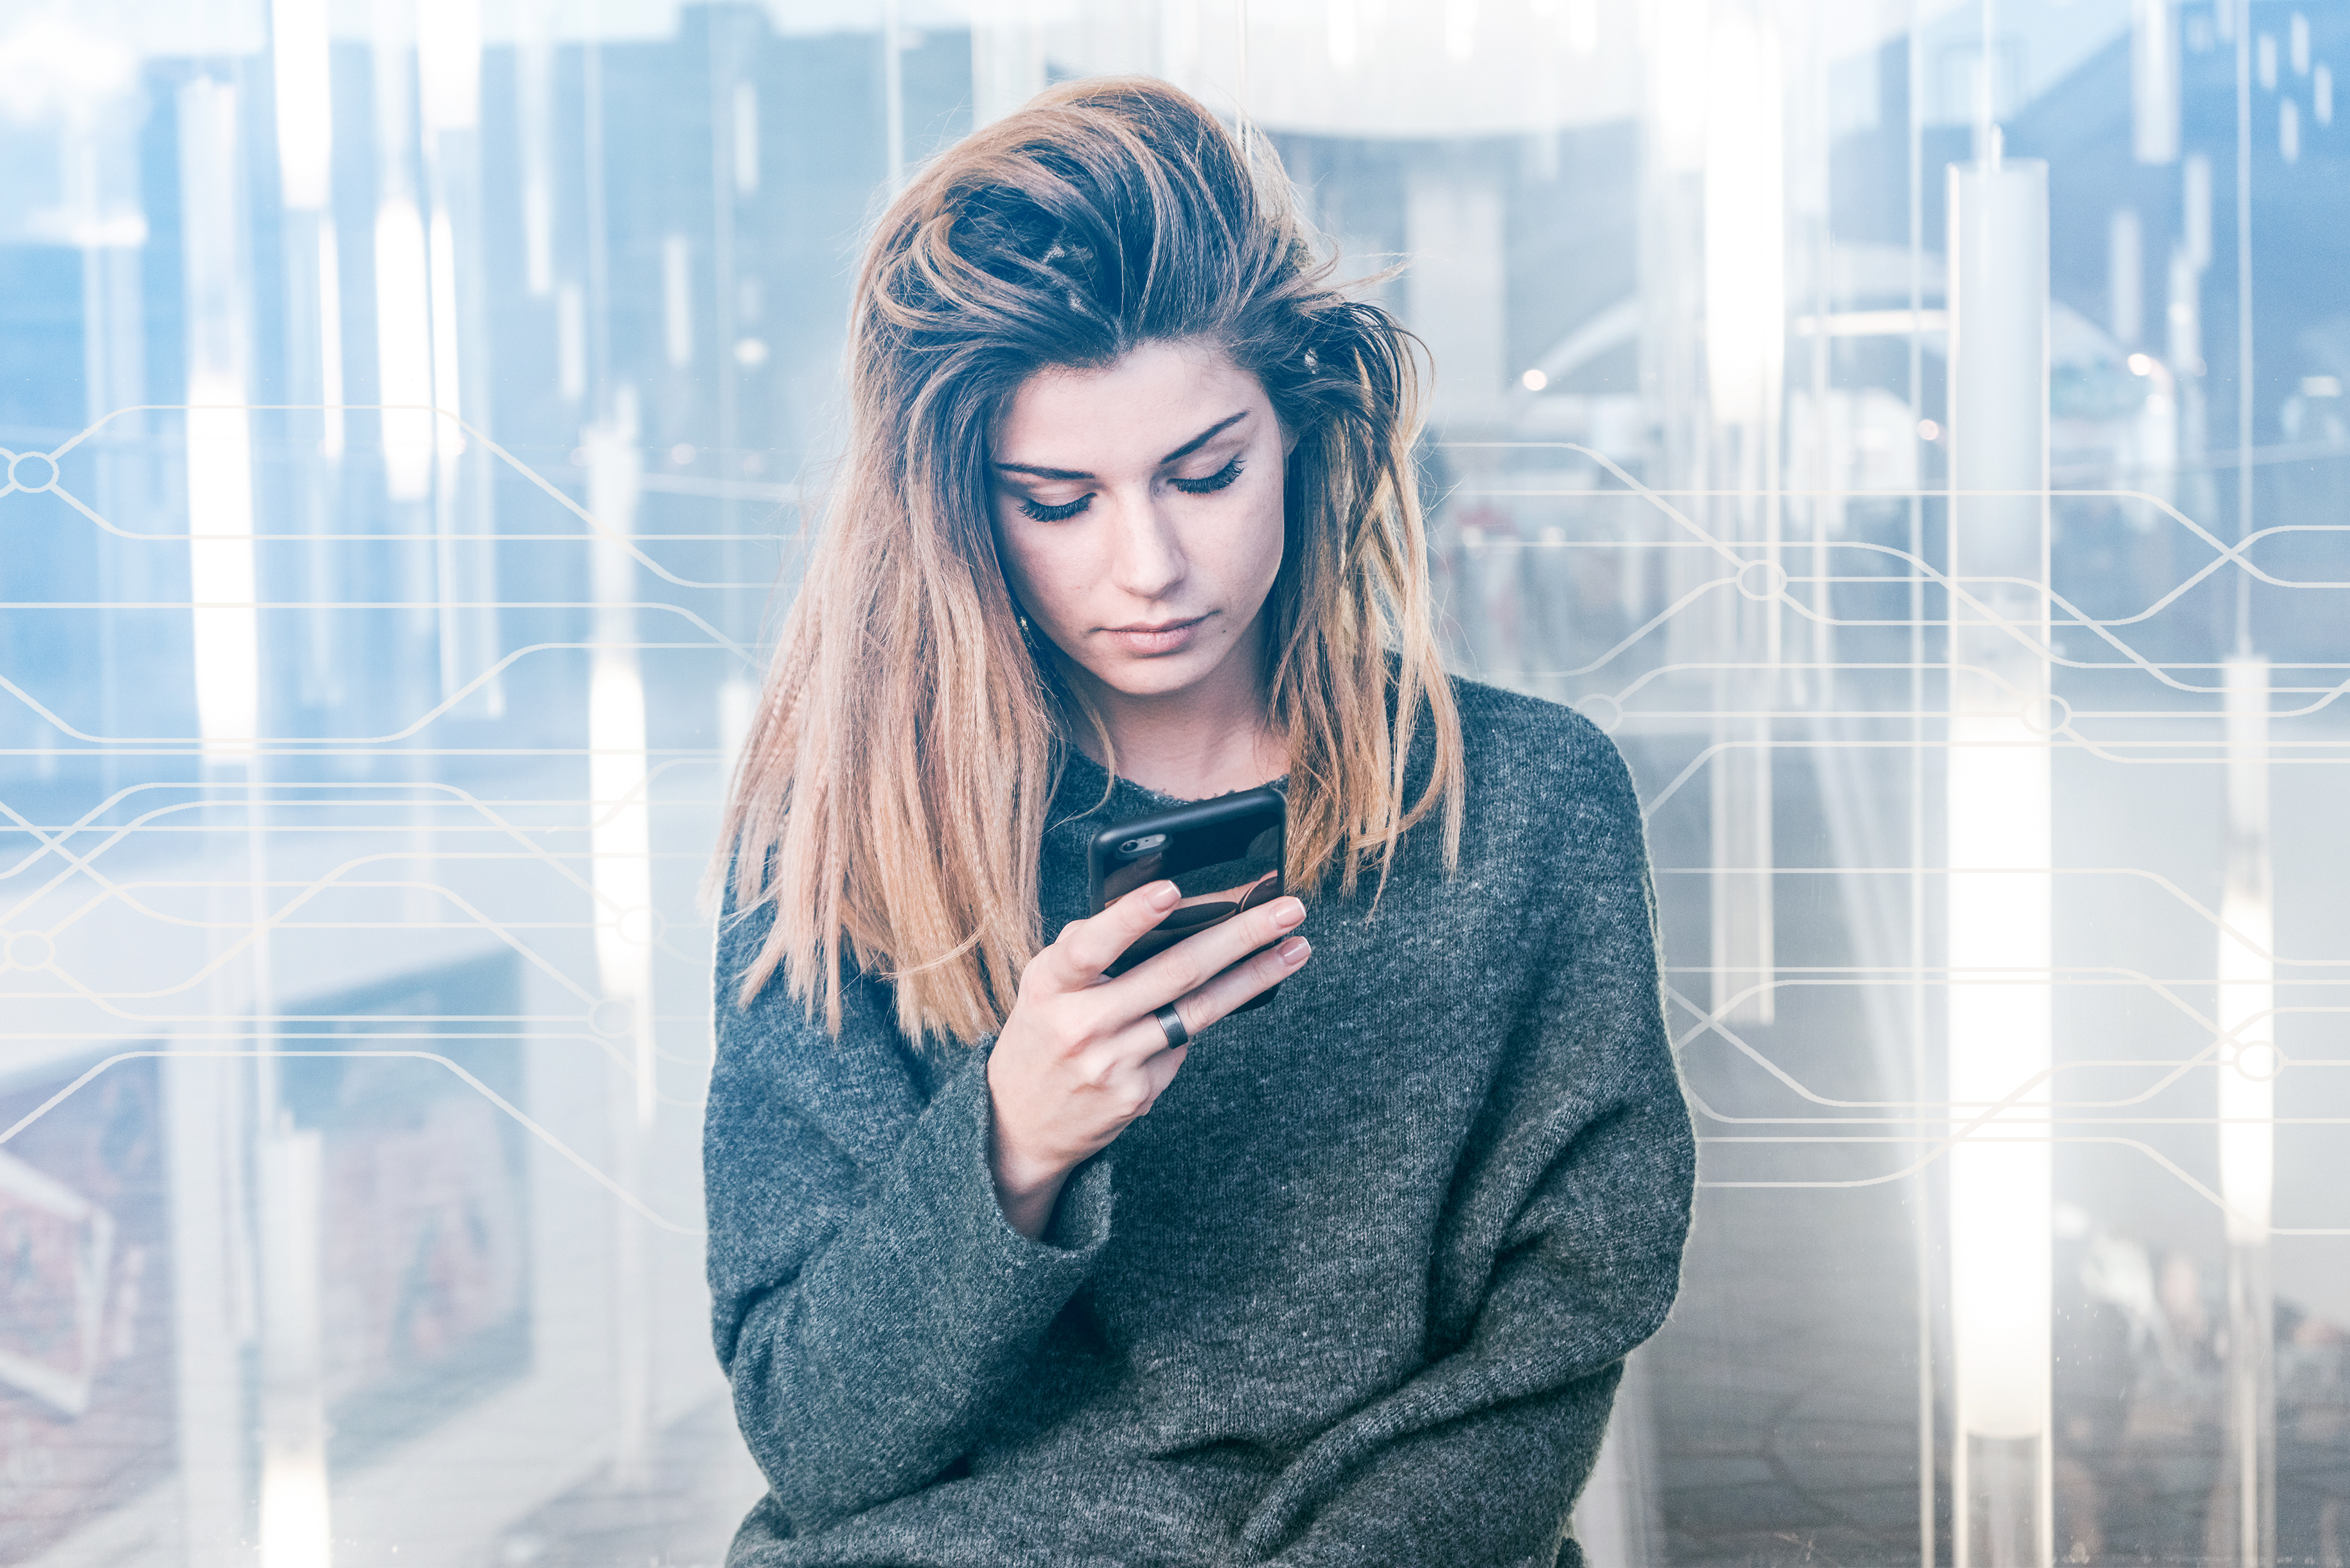 Confidence / Sad Girl on Phone